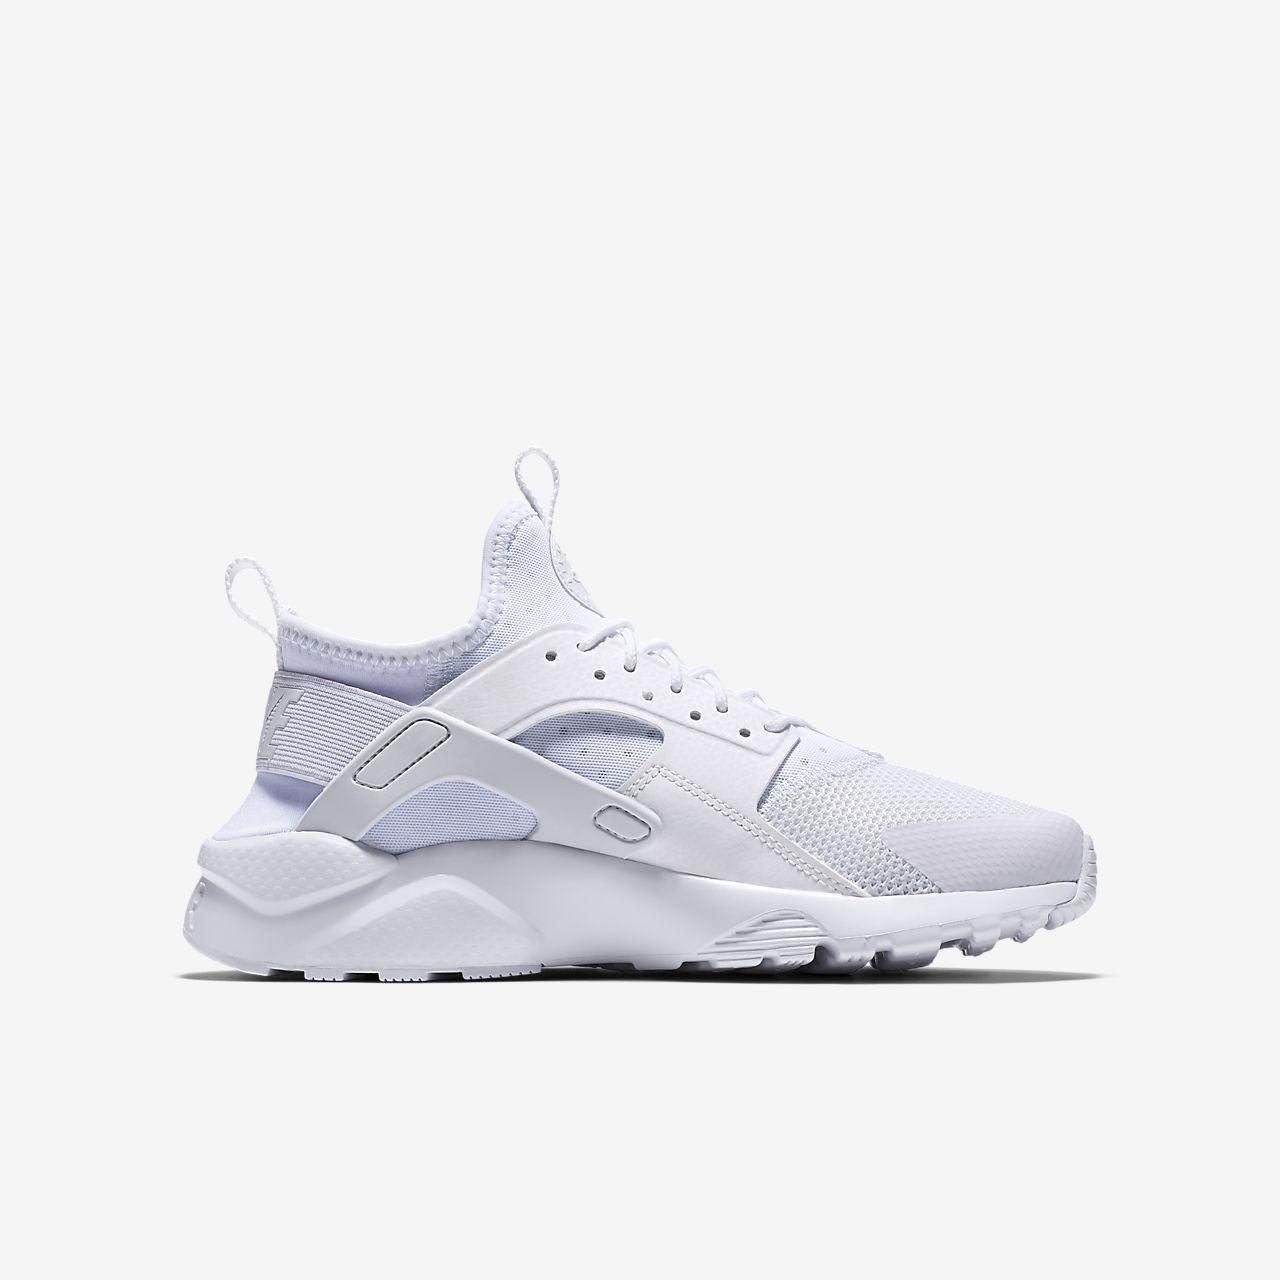 Nike Air Huarache Ultra Kinderschoen